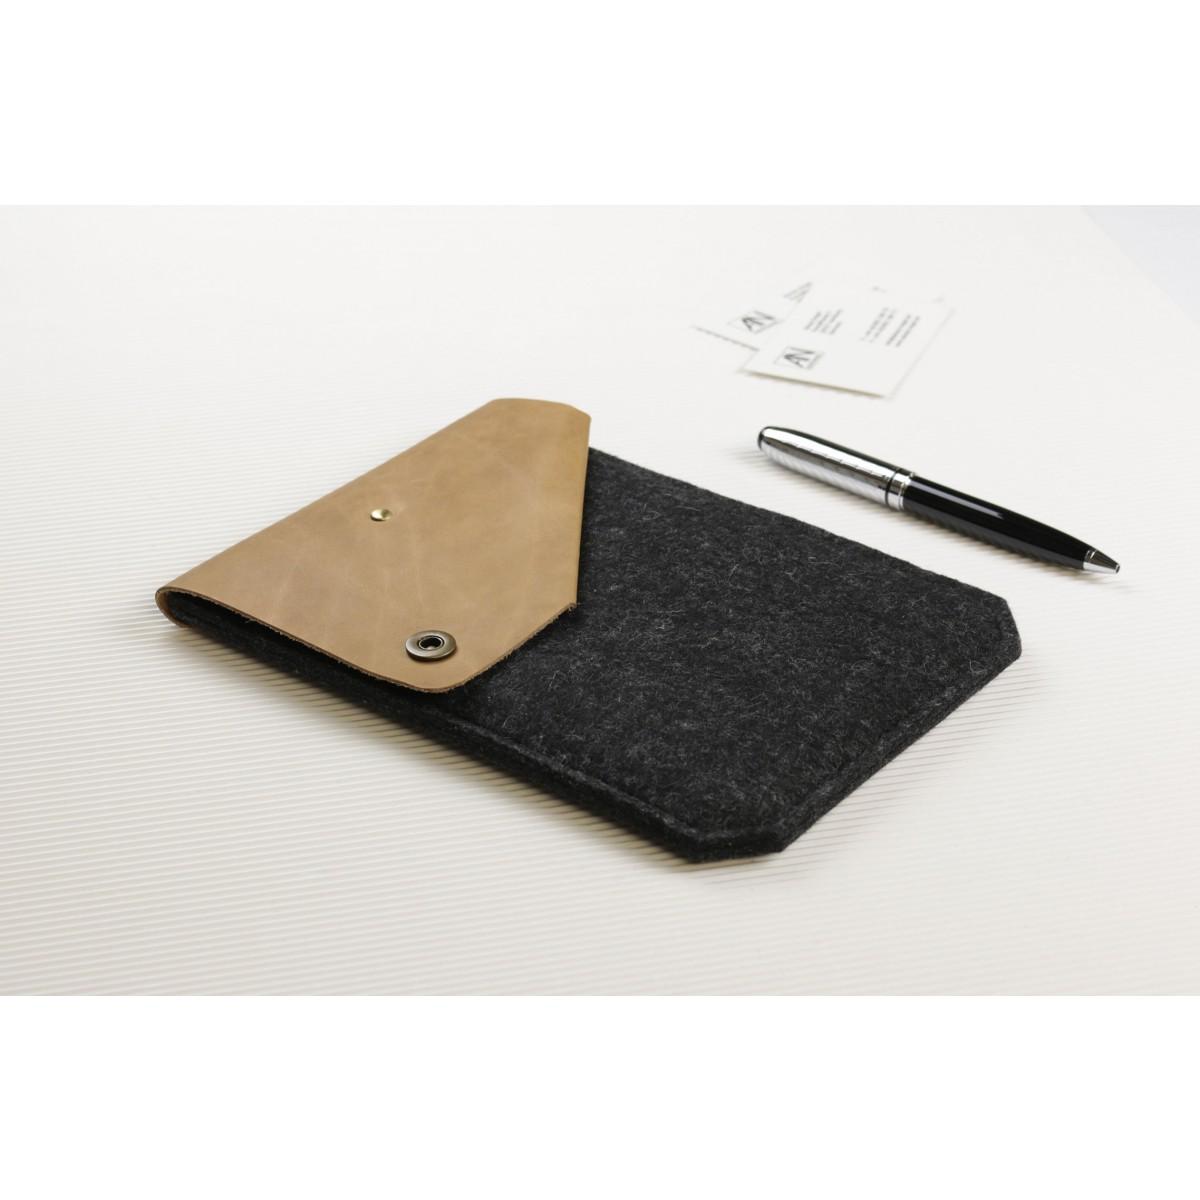 Alexej Nagel Hülle für iPad Air / iPad Air 2 aus Vintage Leder & Filz anthrazit